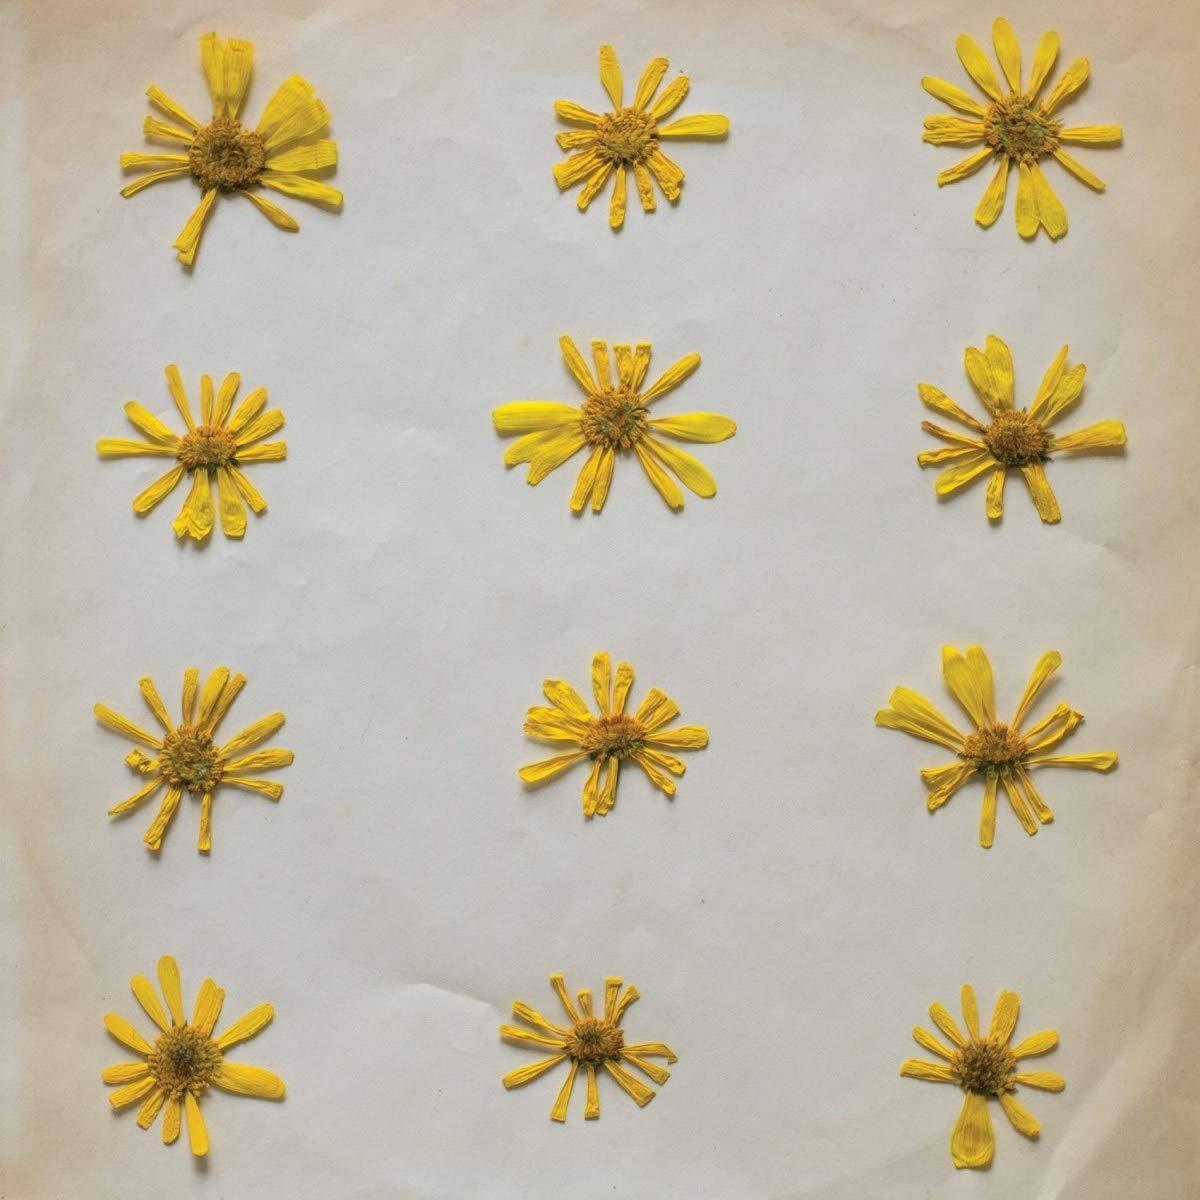 Vinilo : Molochs - Flowers In The Spring (Digital Download Card)